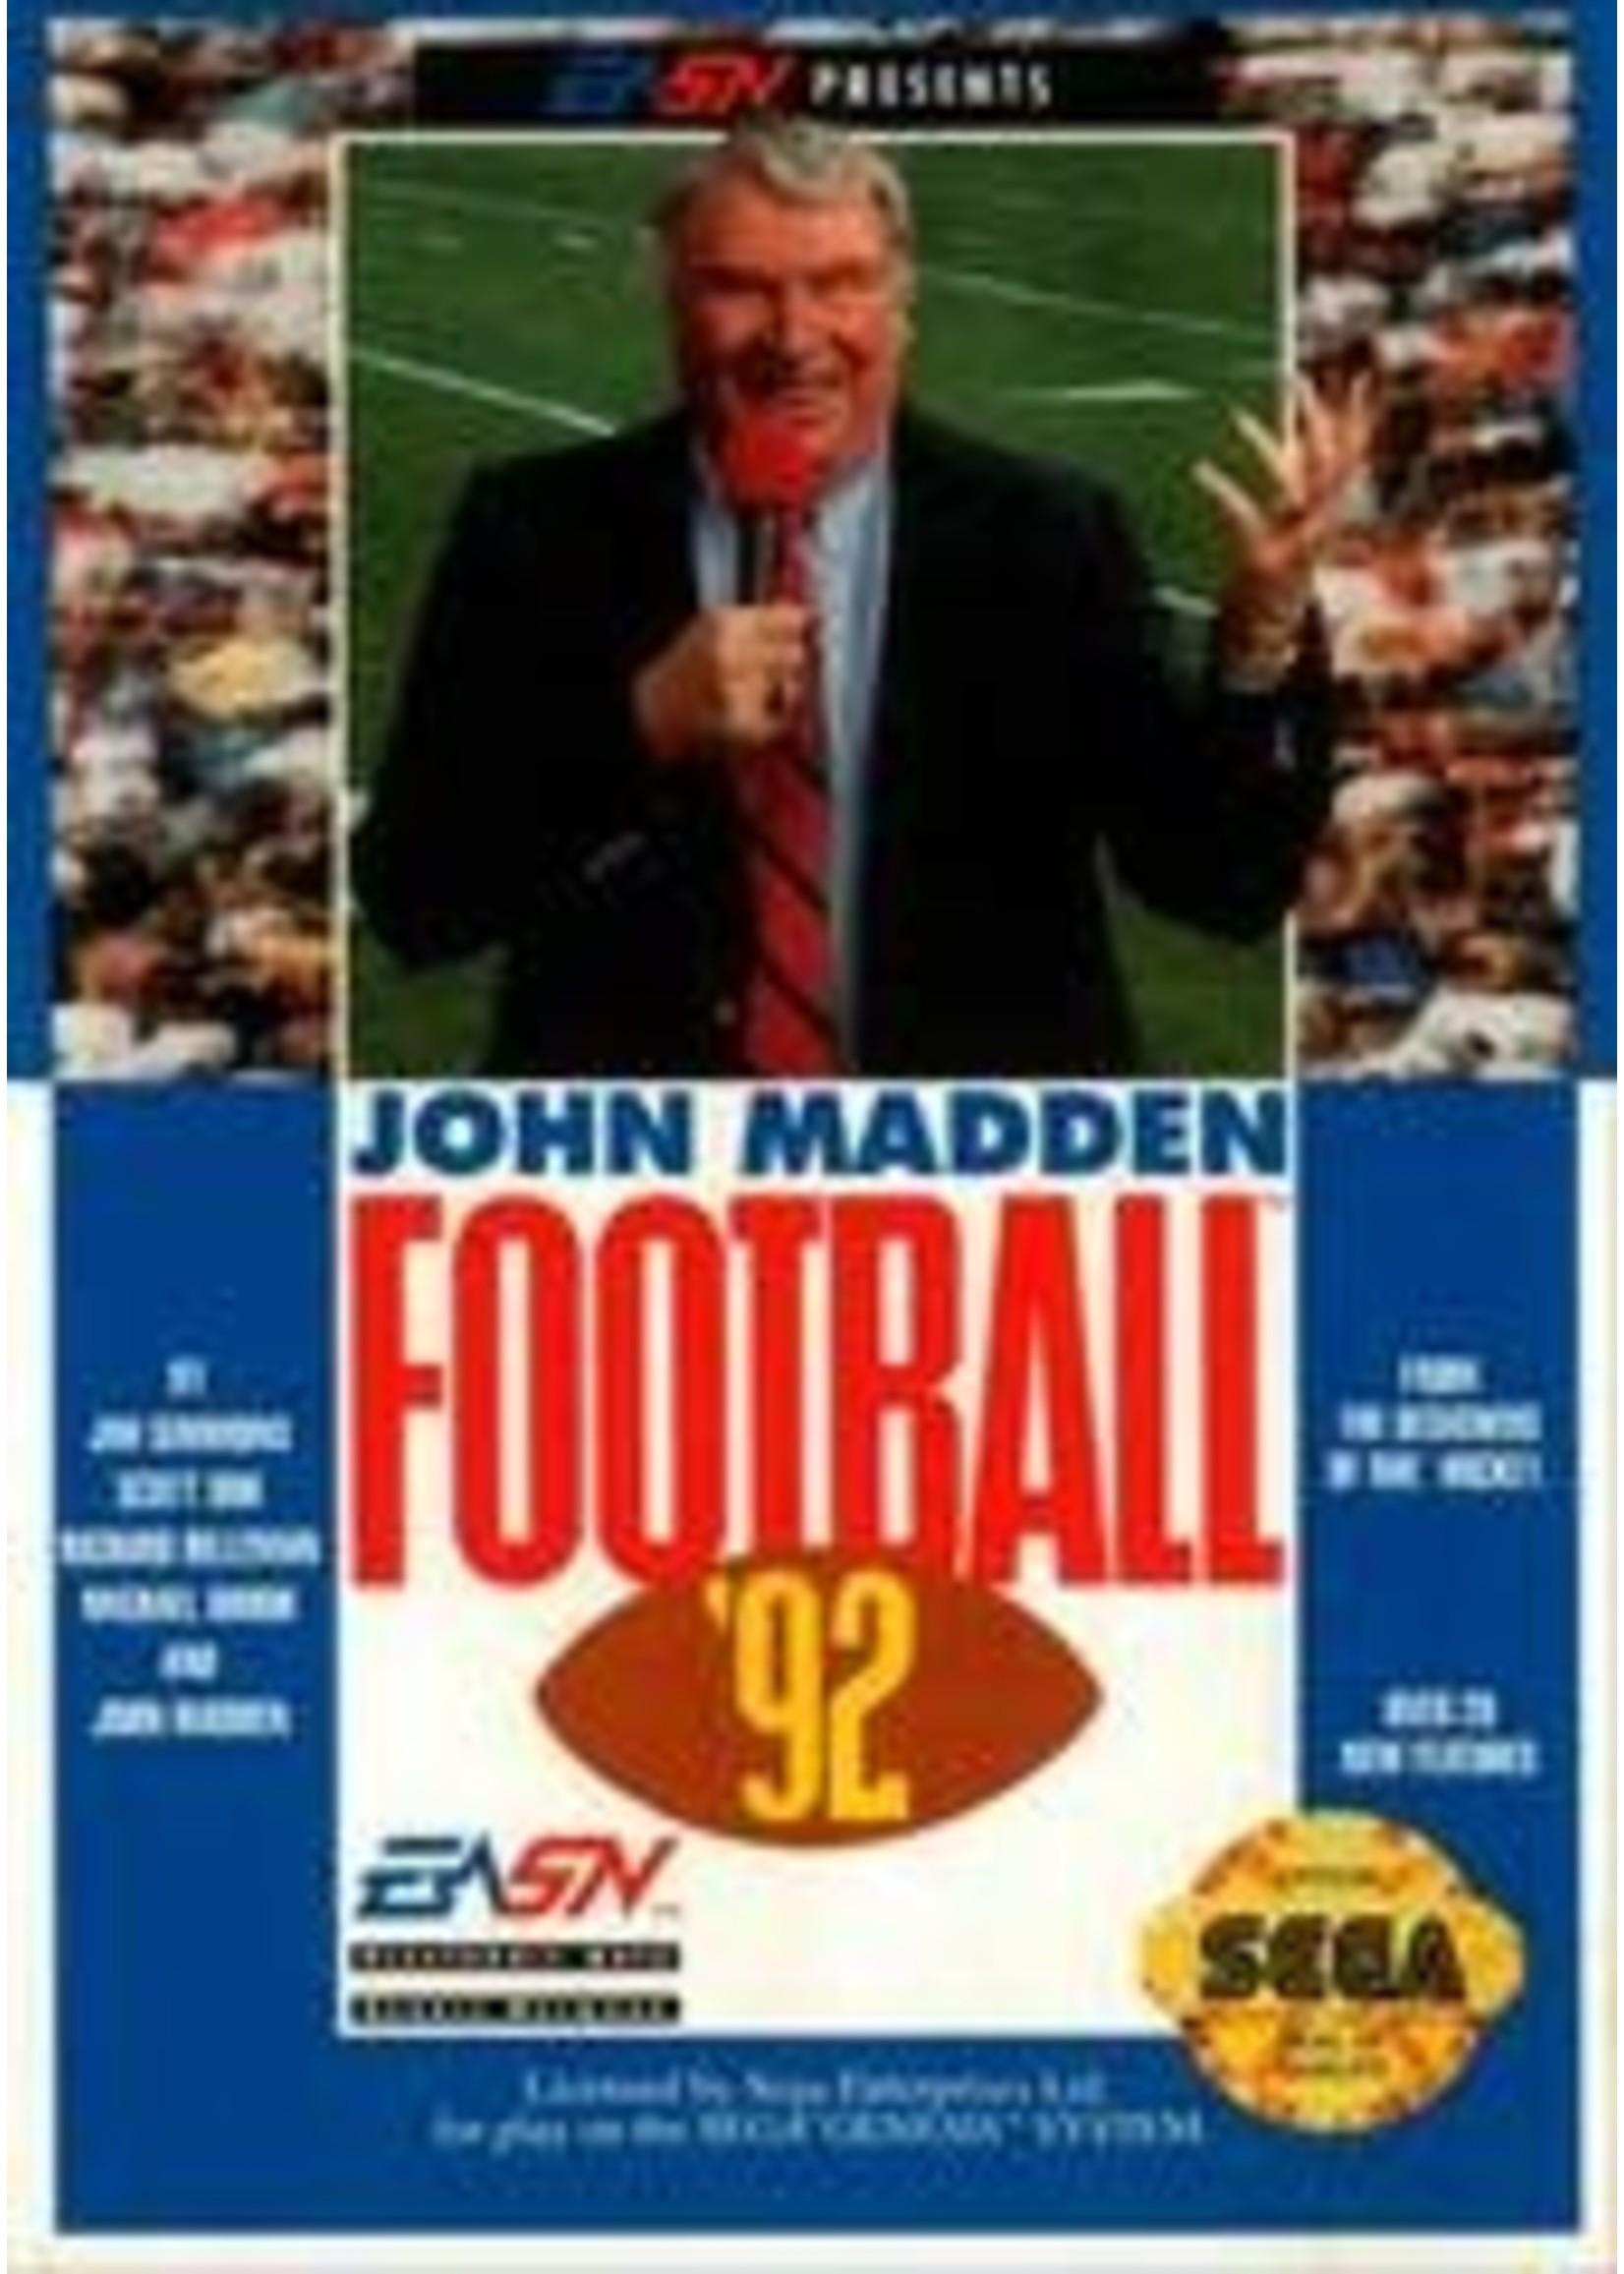 John Madden Football '92 Sega Genesis